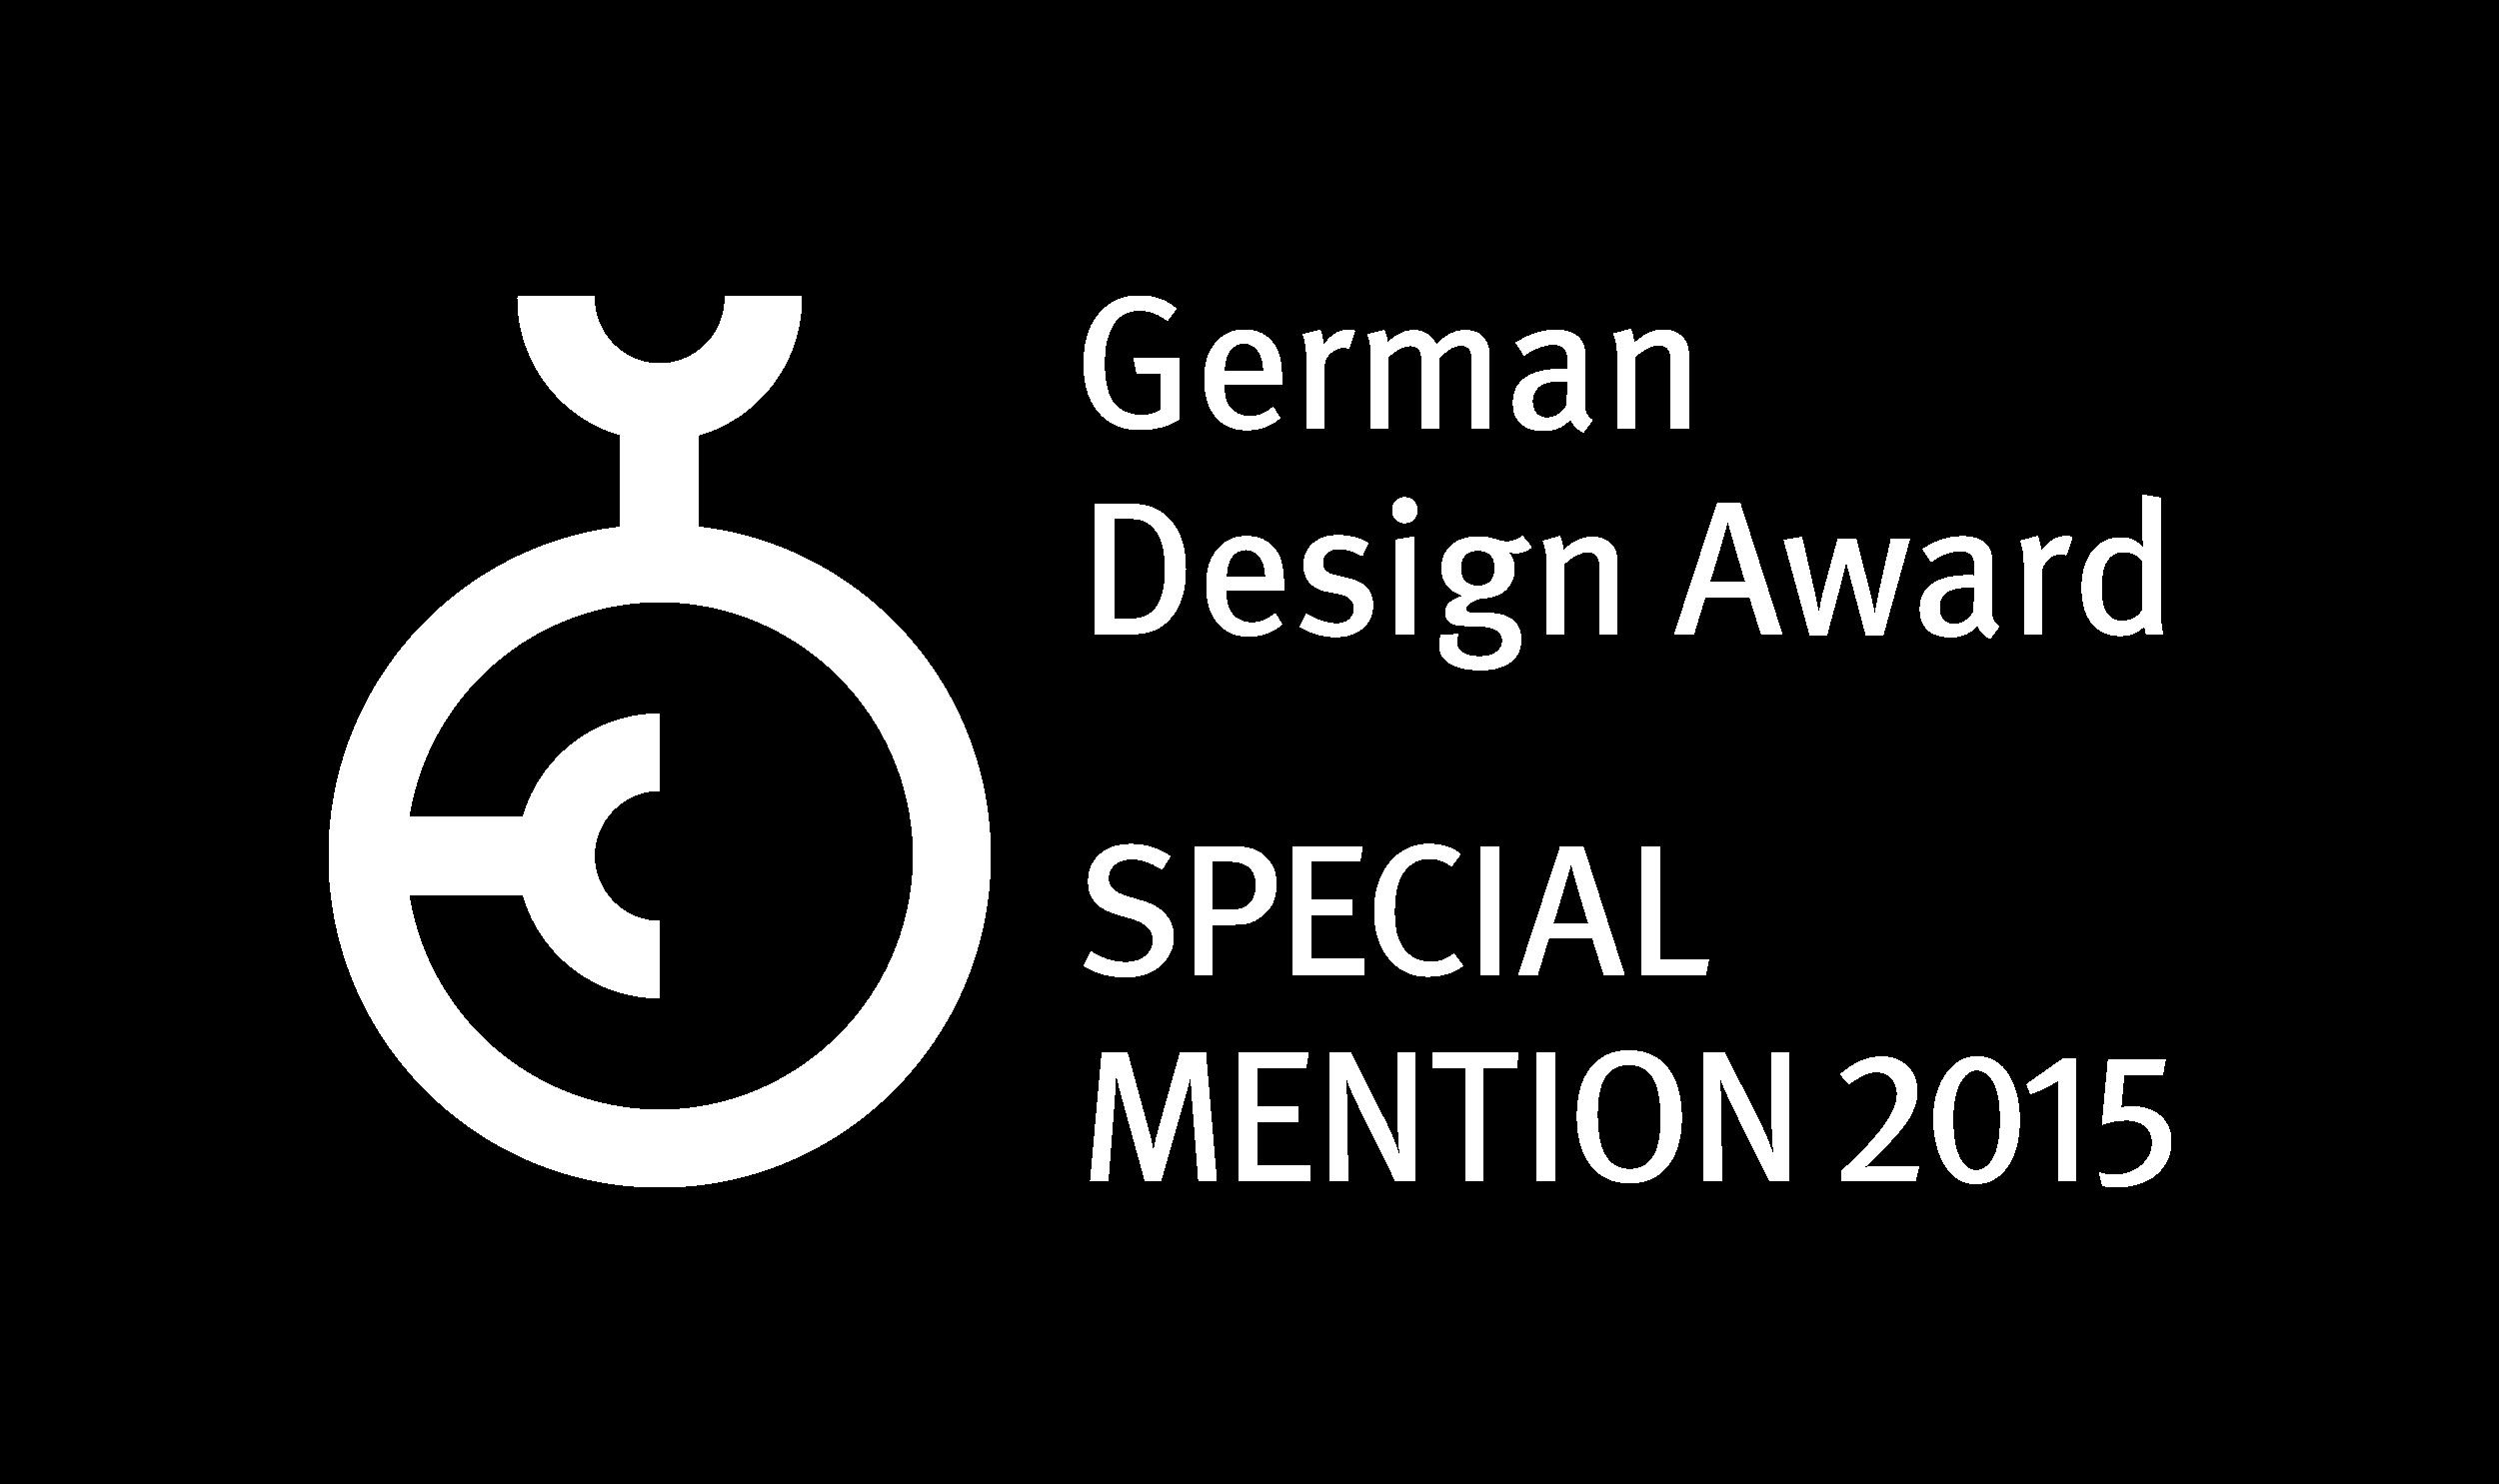 German_Design_Award_Special_Mention_2015